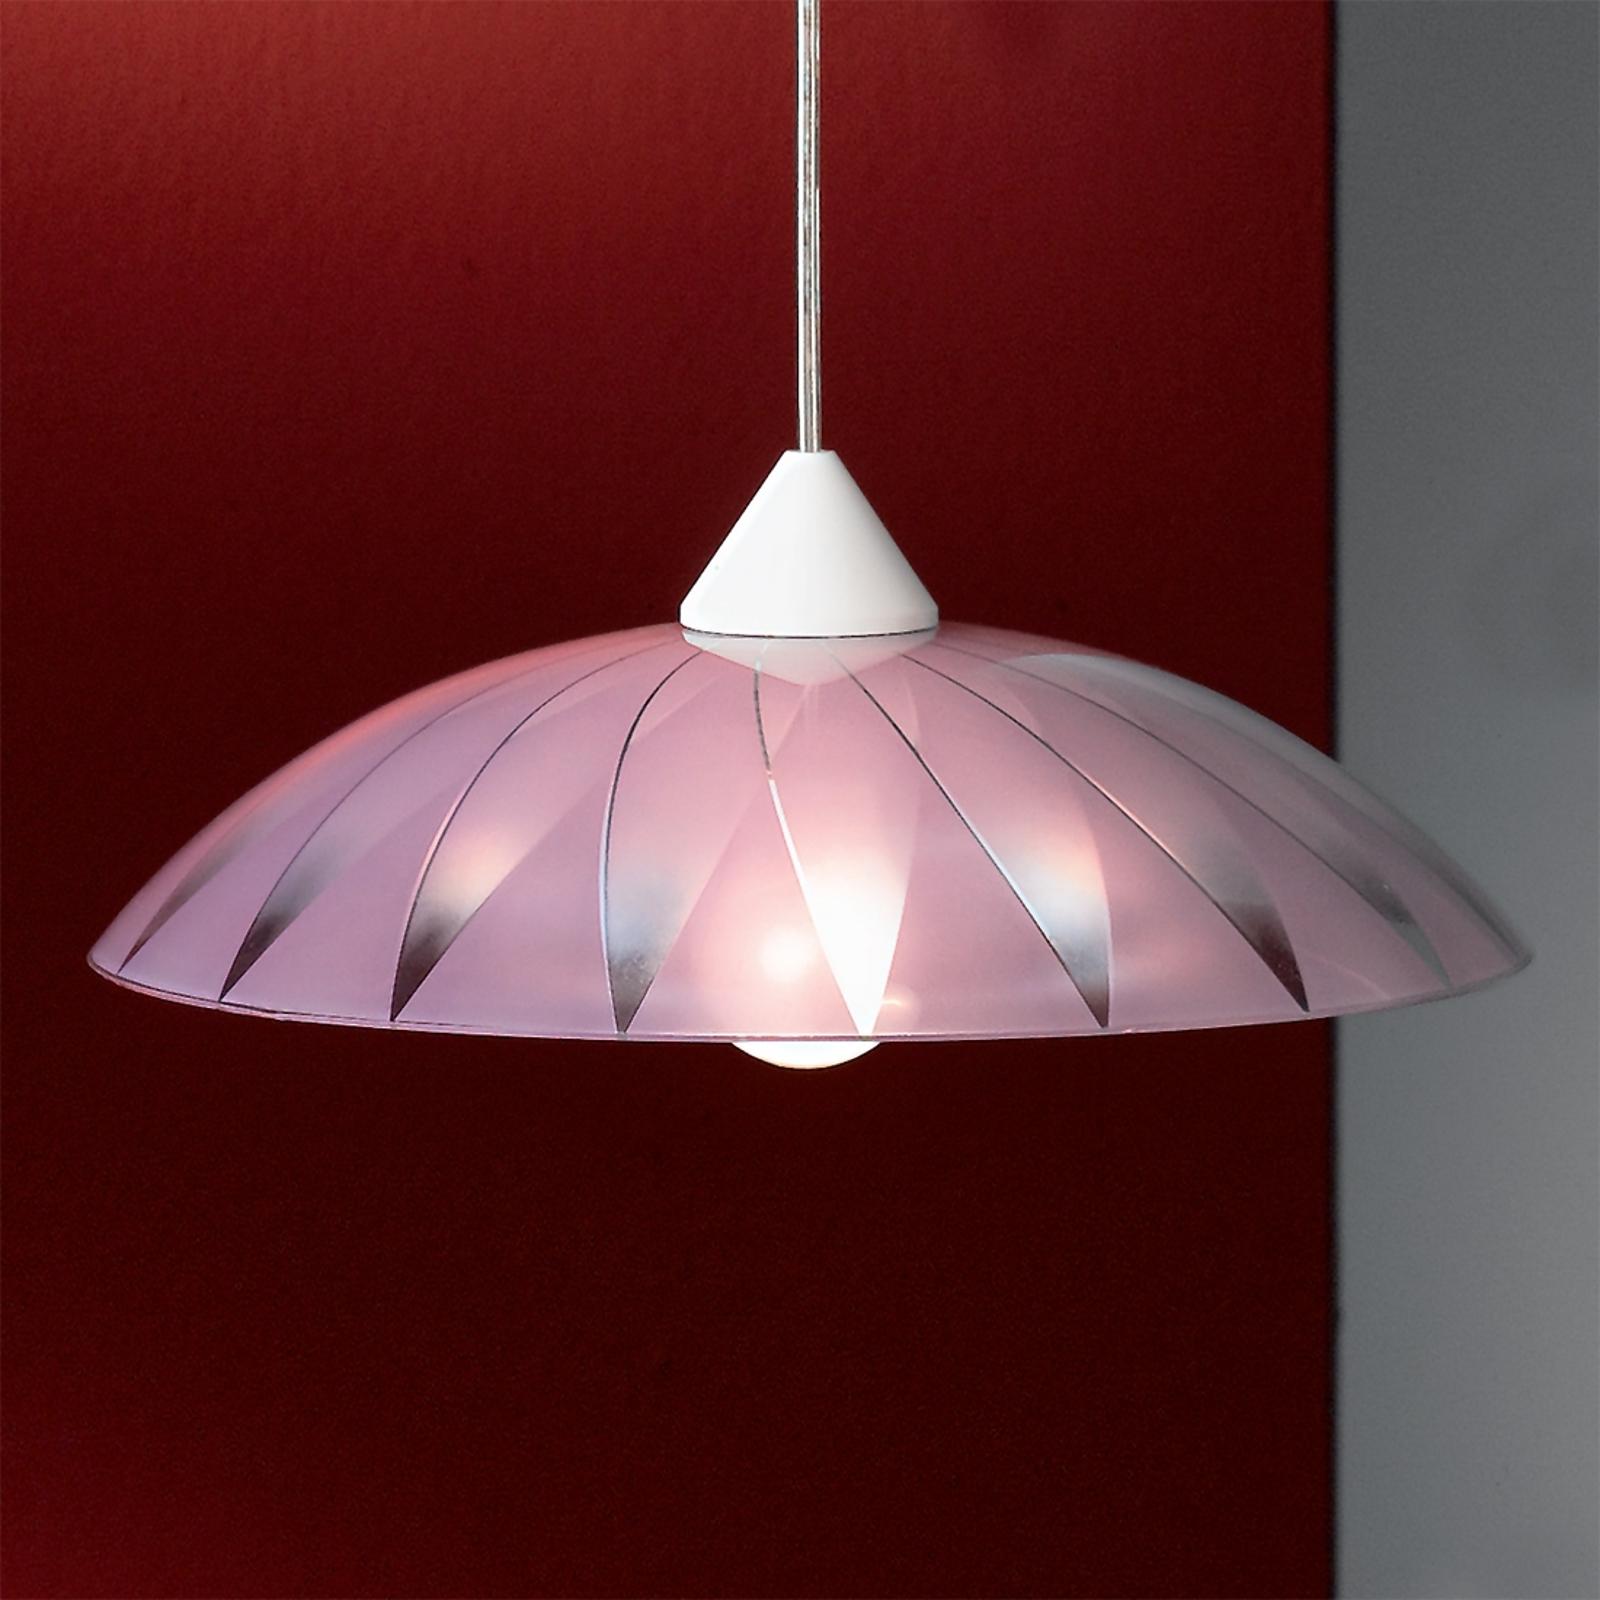 Dekoracyjna lampa wisząca Marelli, fioletowa